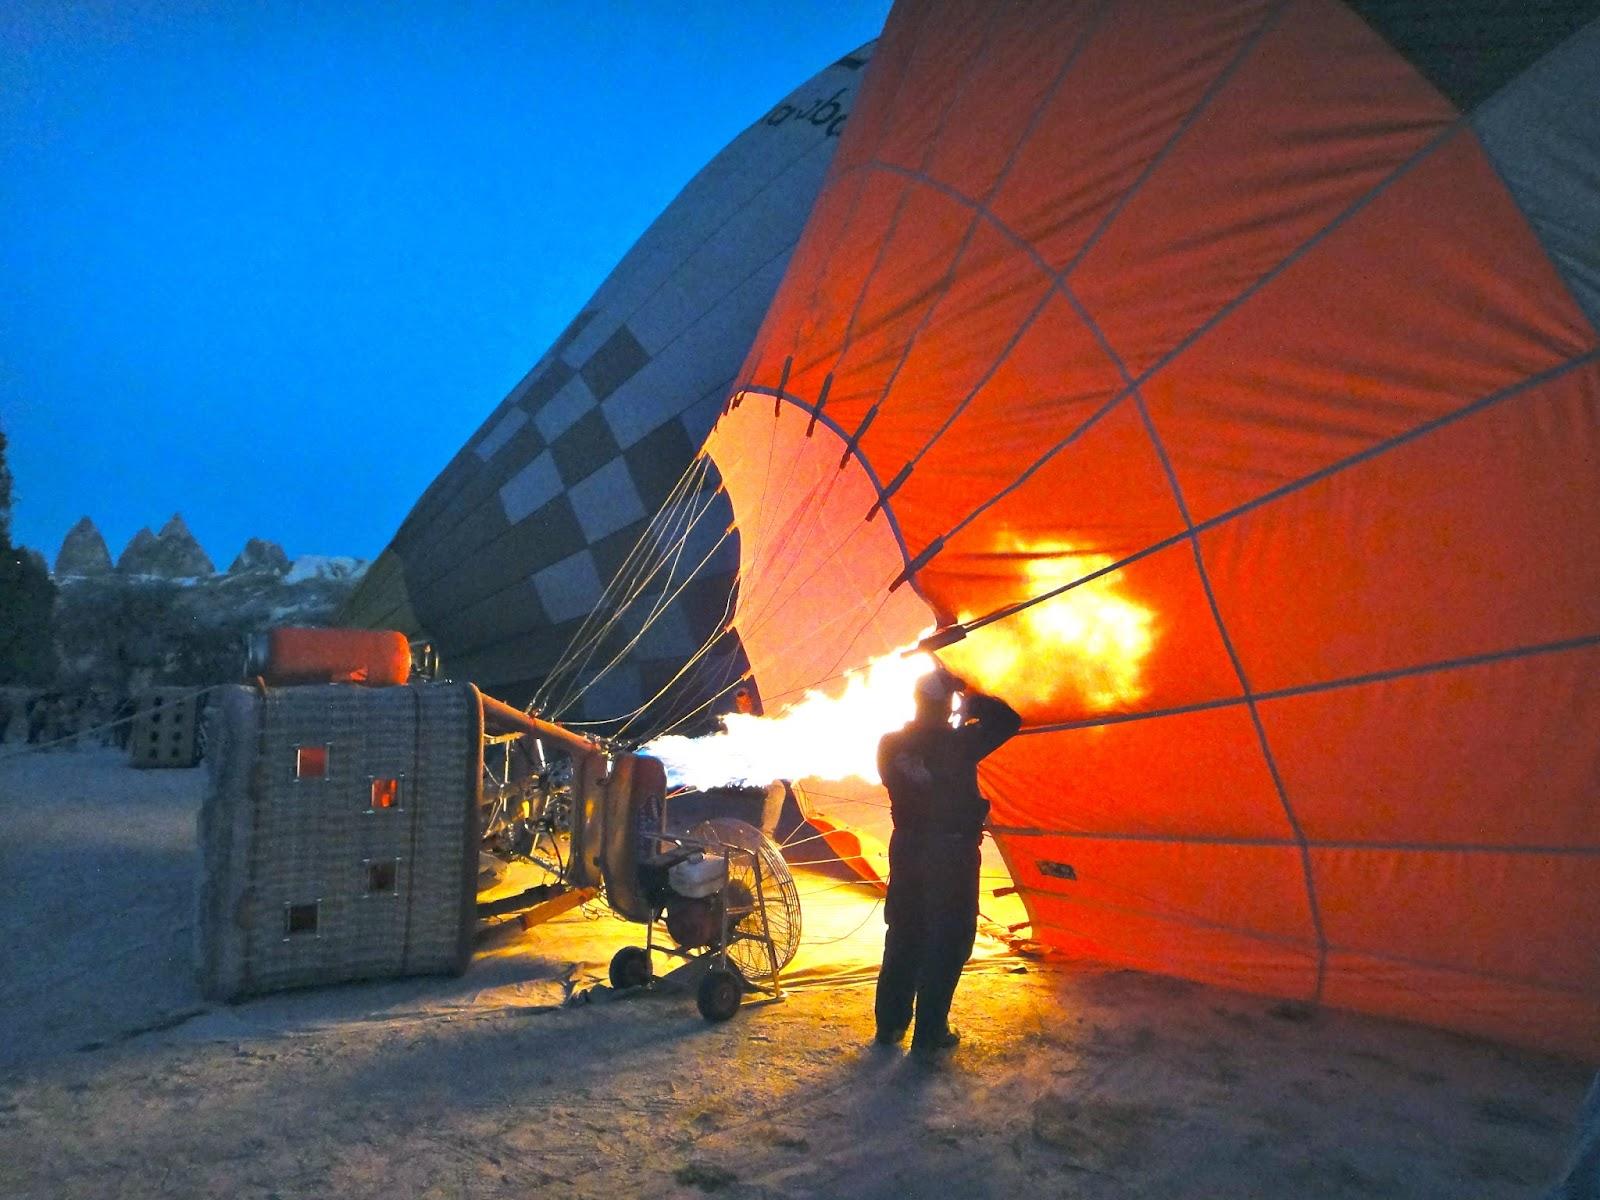 Warming up balloon at Cappadocia Turkey